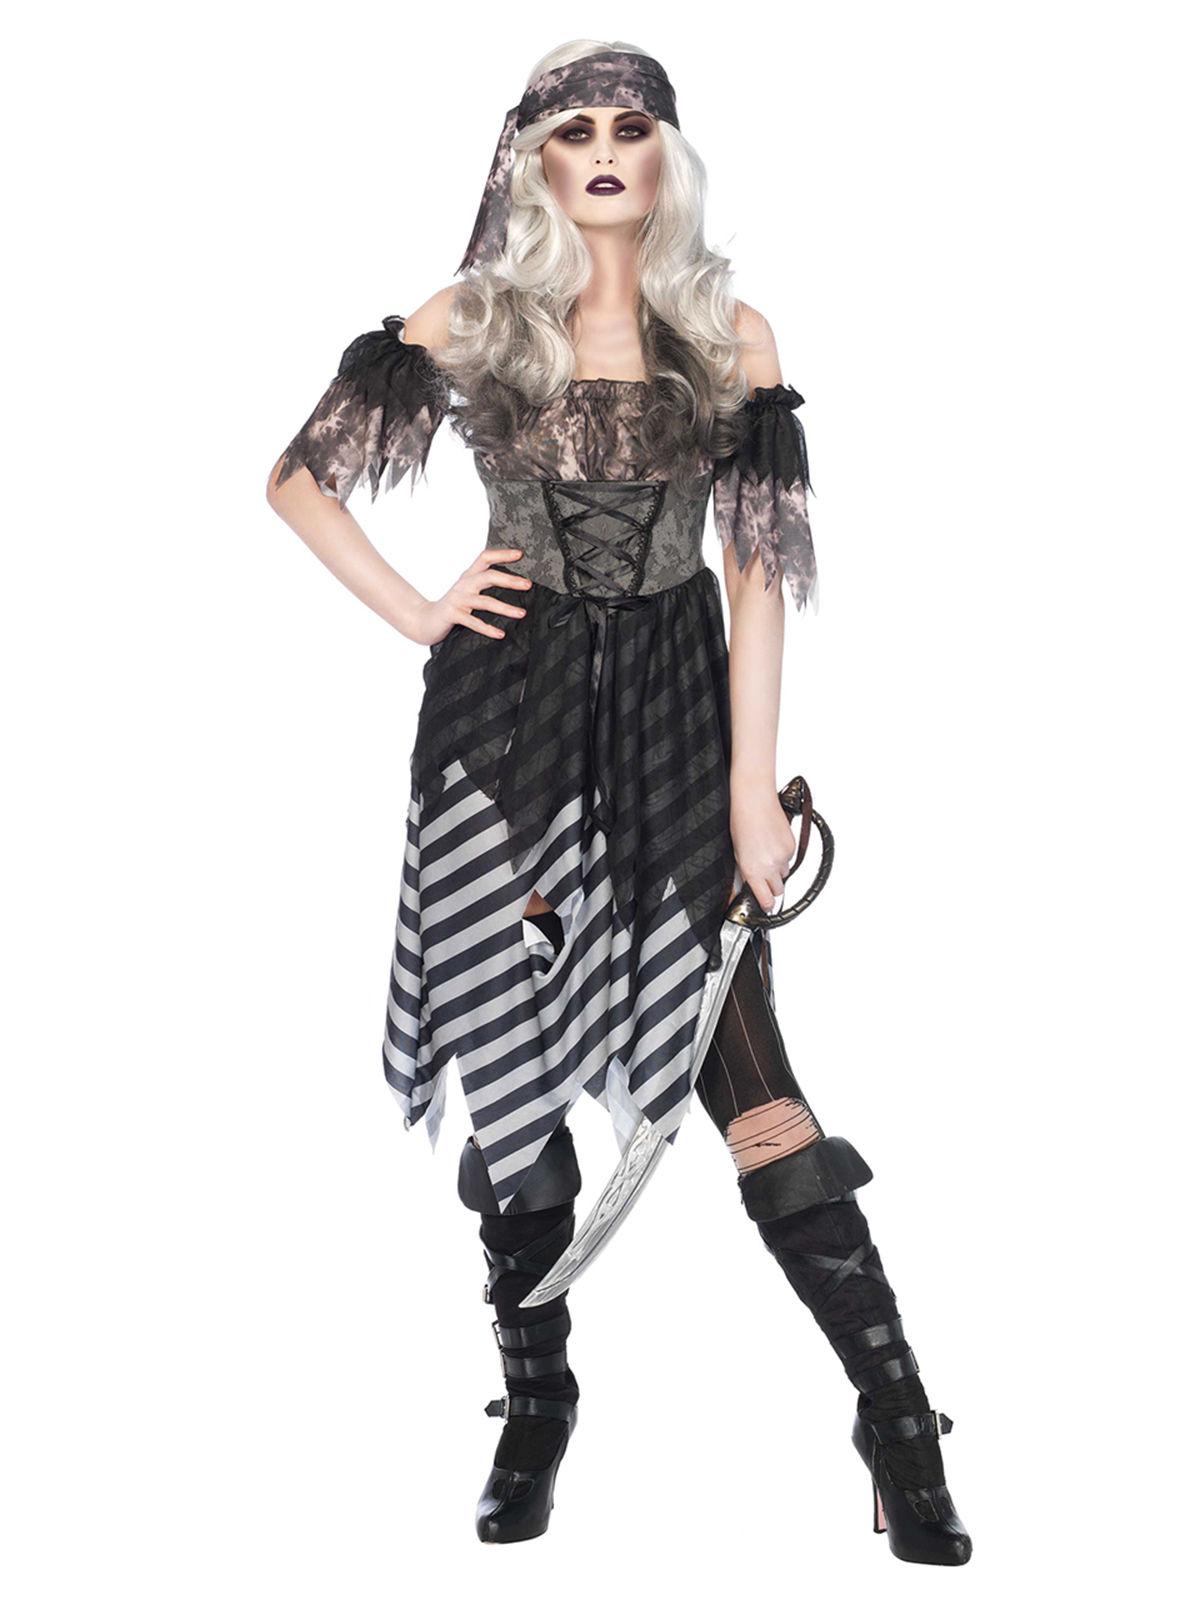 geister piratin halloween damenkost m schwarz grau g nstige faschings kost me bei karneval. Black Bedroom Furniture Sets. Home Design Ideas